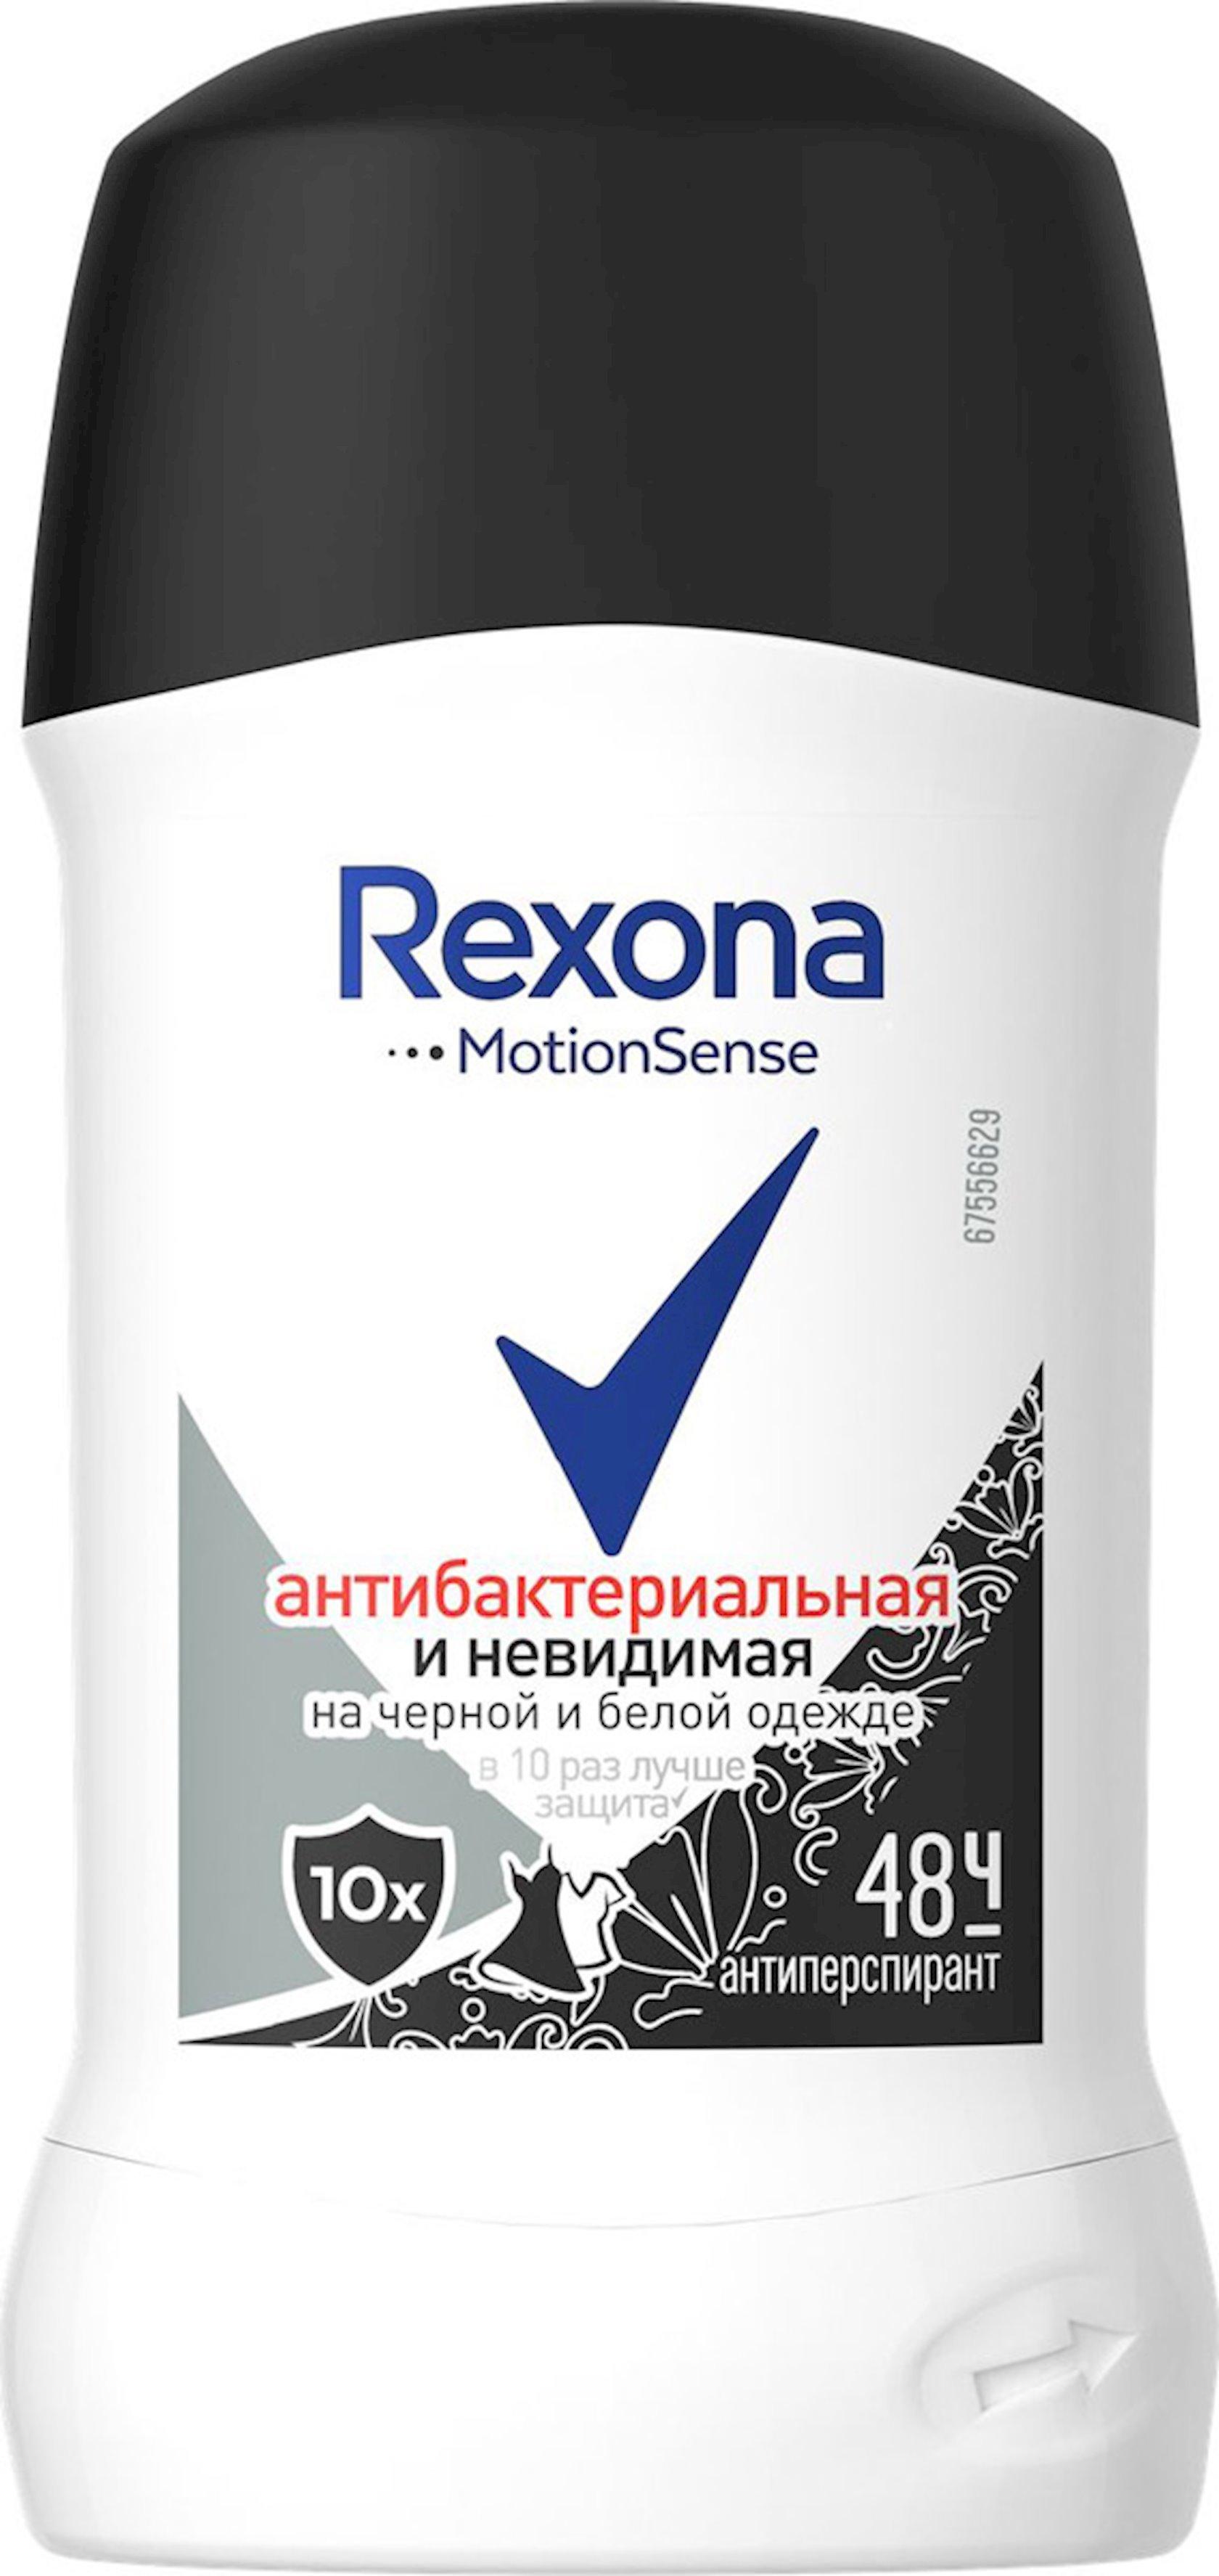 Dezodorant-antiperspirant antibakteril və görünməz, Rexona 40 ml